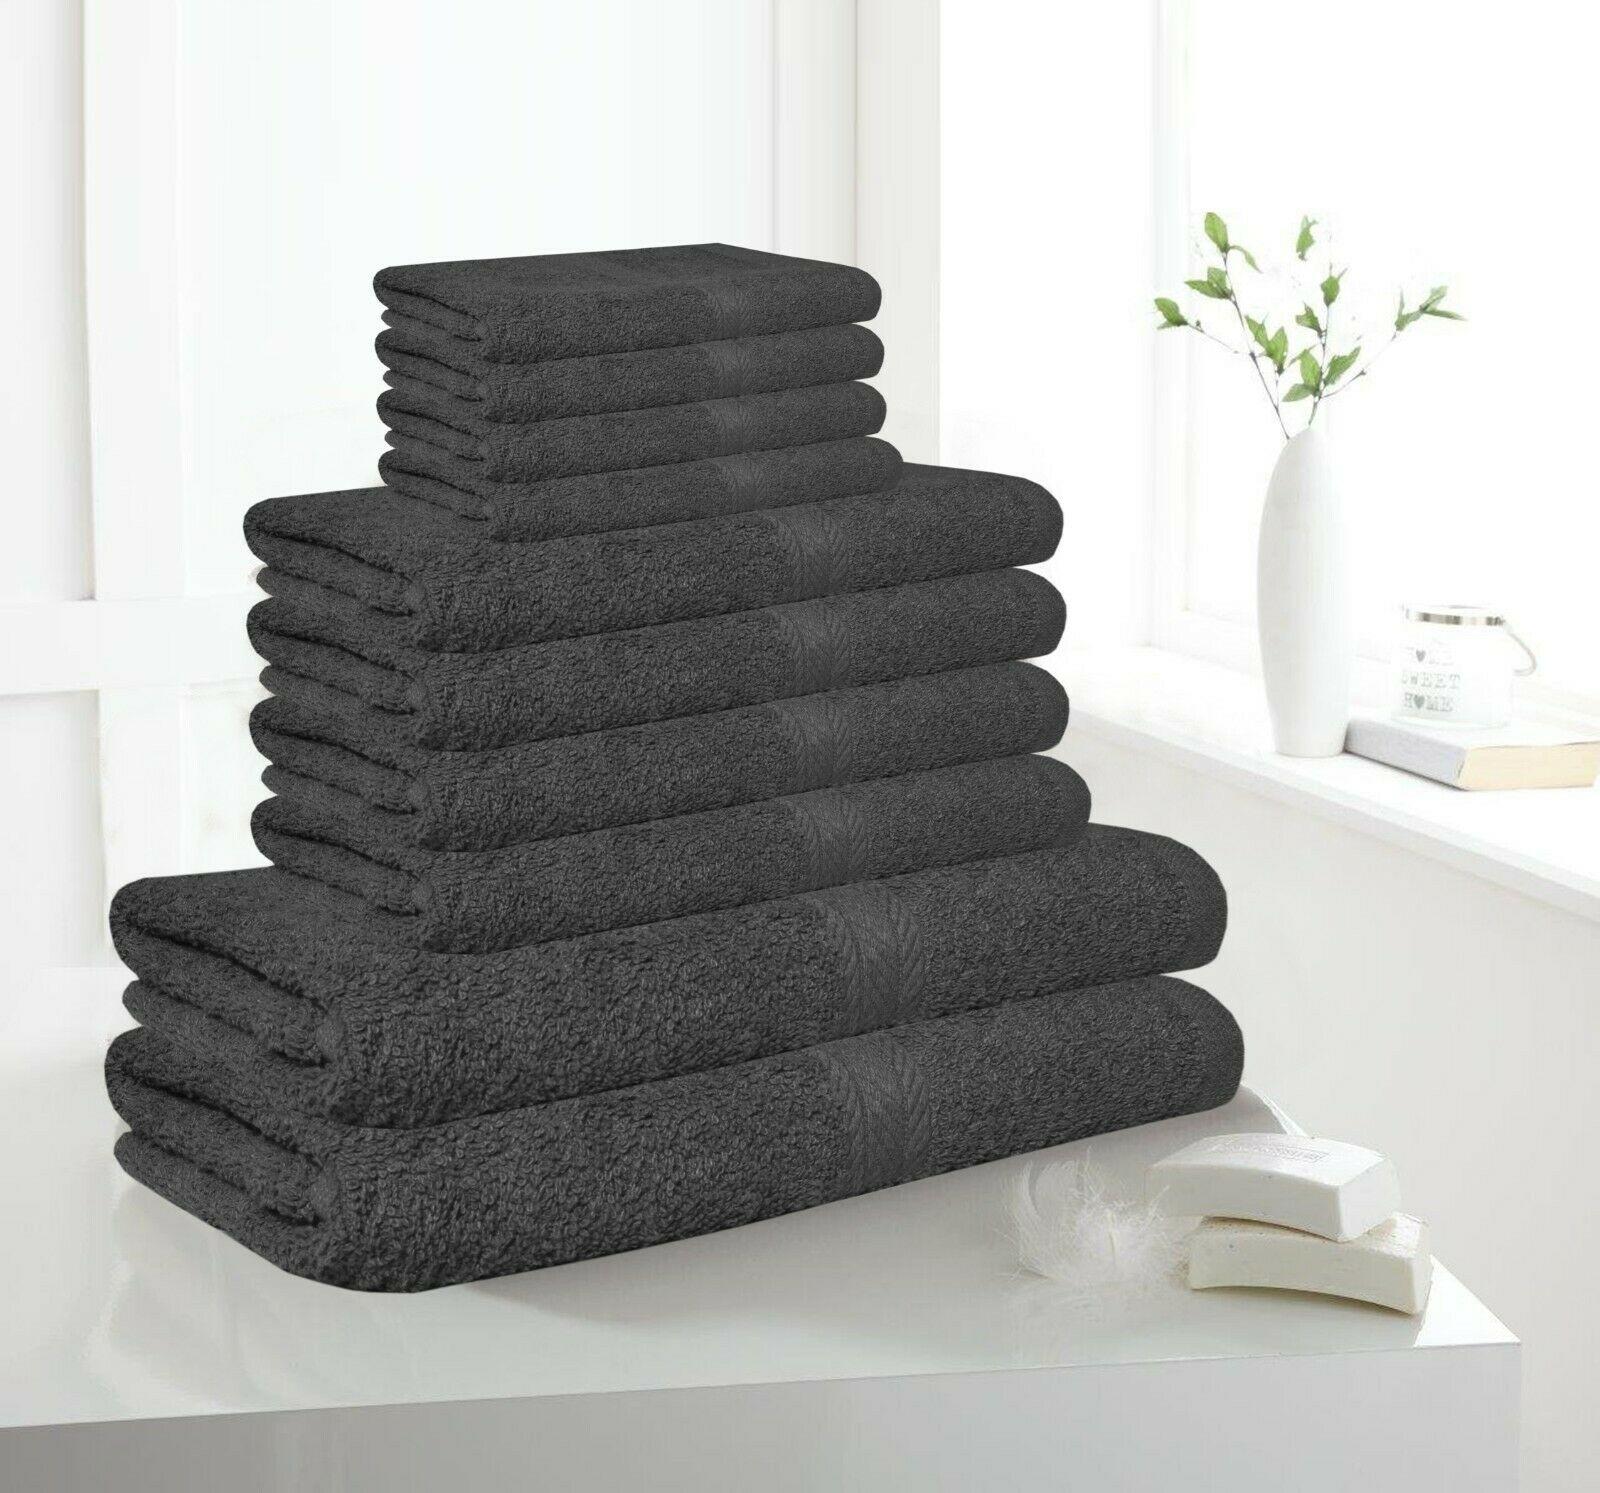 10 Piece Bath Towel Set Soft Egyptian Cotton - Grey £9.99 delivered @ premiumclothing1 / ebay